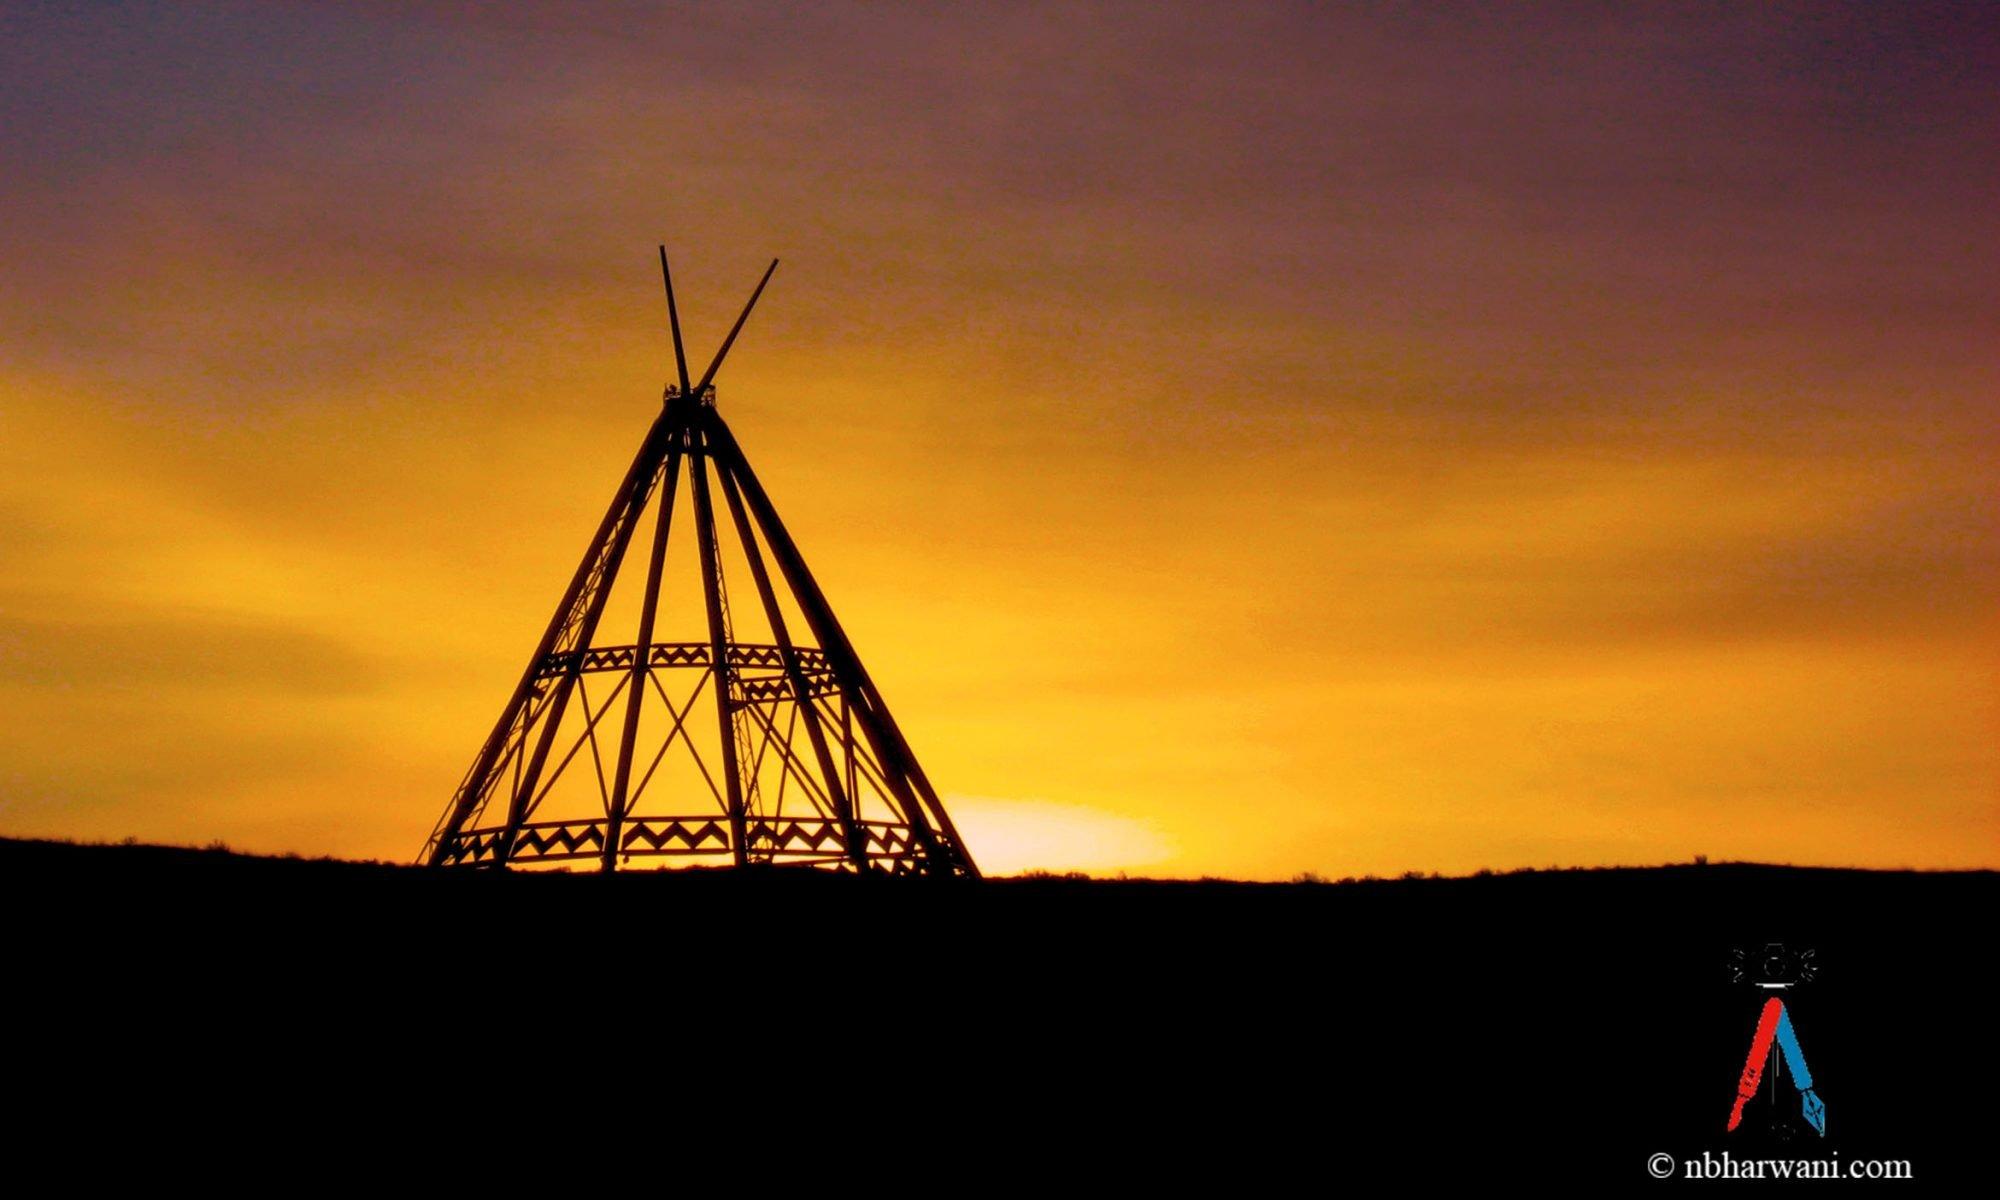 Sunrise at the World's Tallest Tepee, Medicine Hat, Alberta. (Dr. Noorali Bharwani)